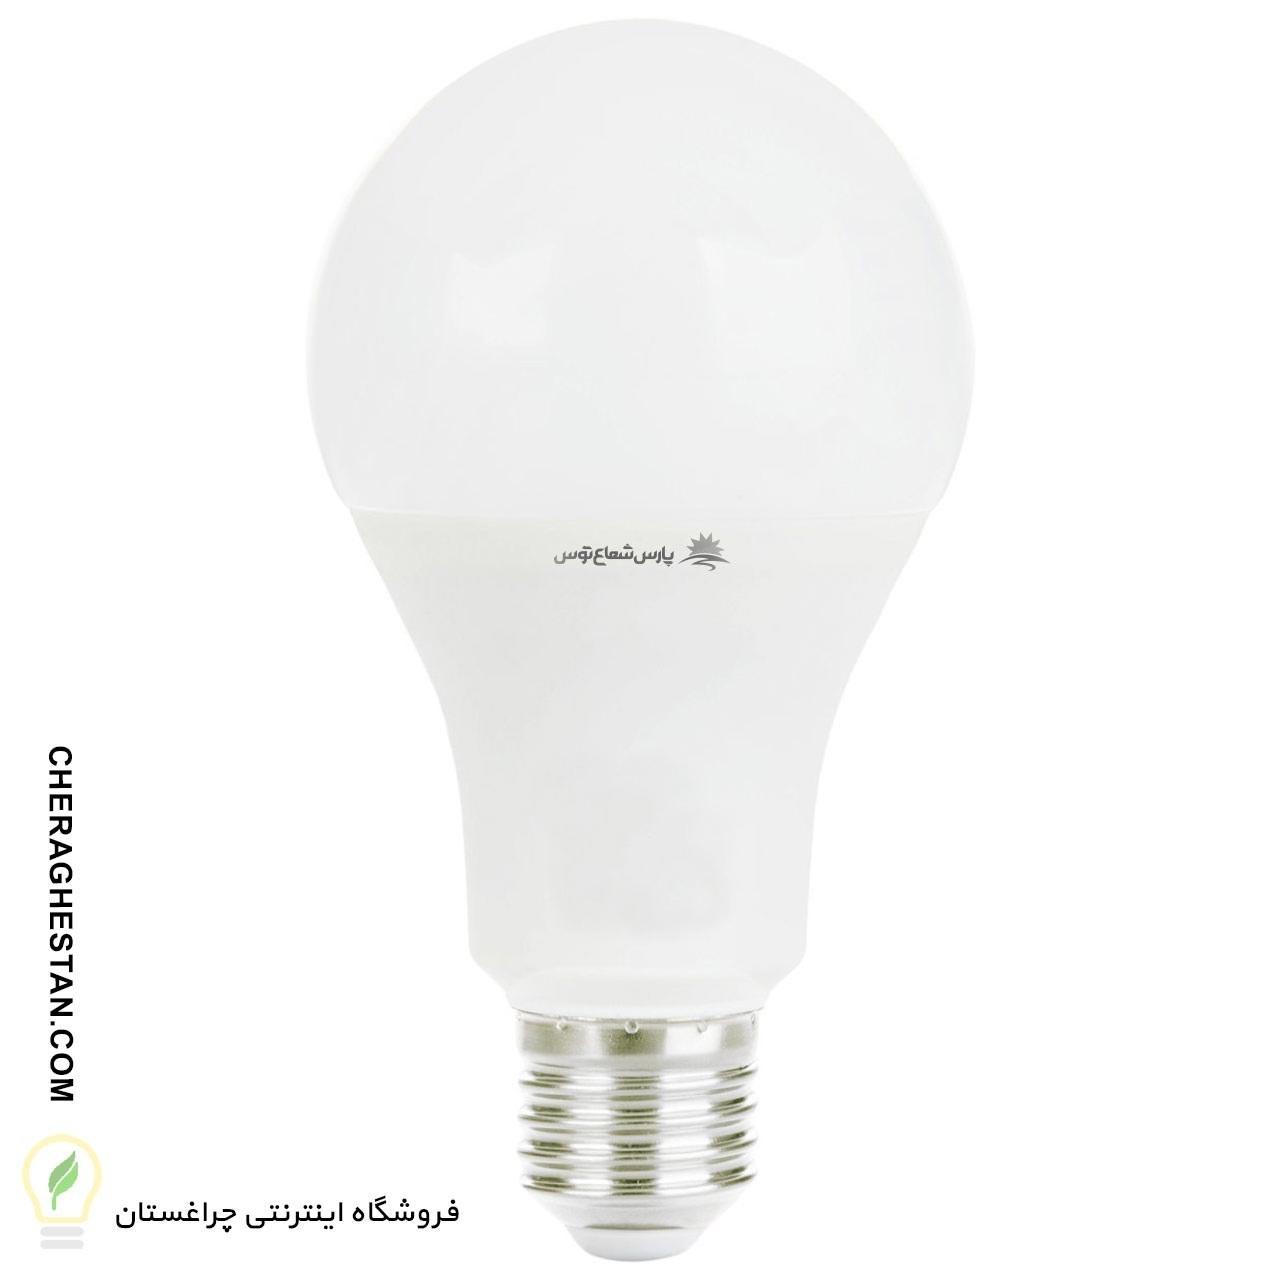 لامپ ال اي دي حبابی ۱۵ وات پارس شعاع توس